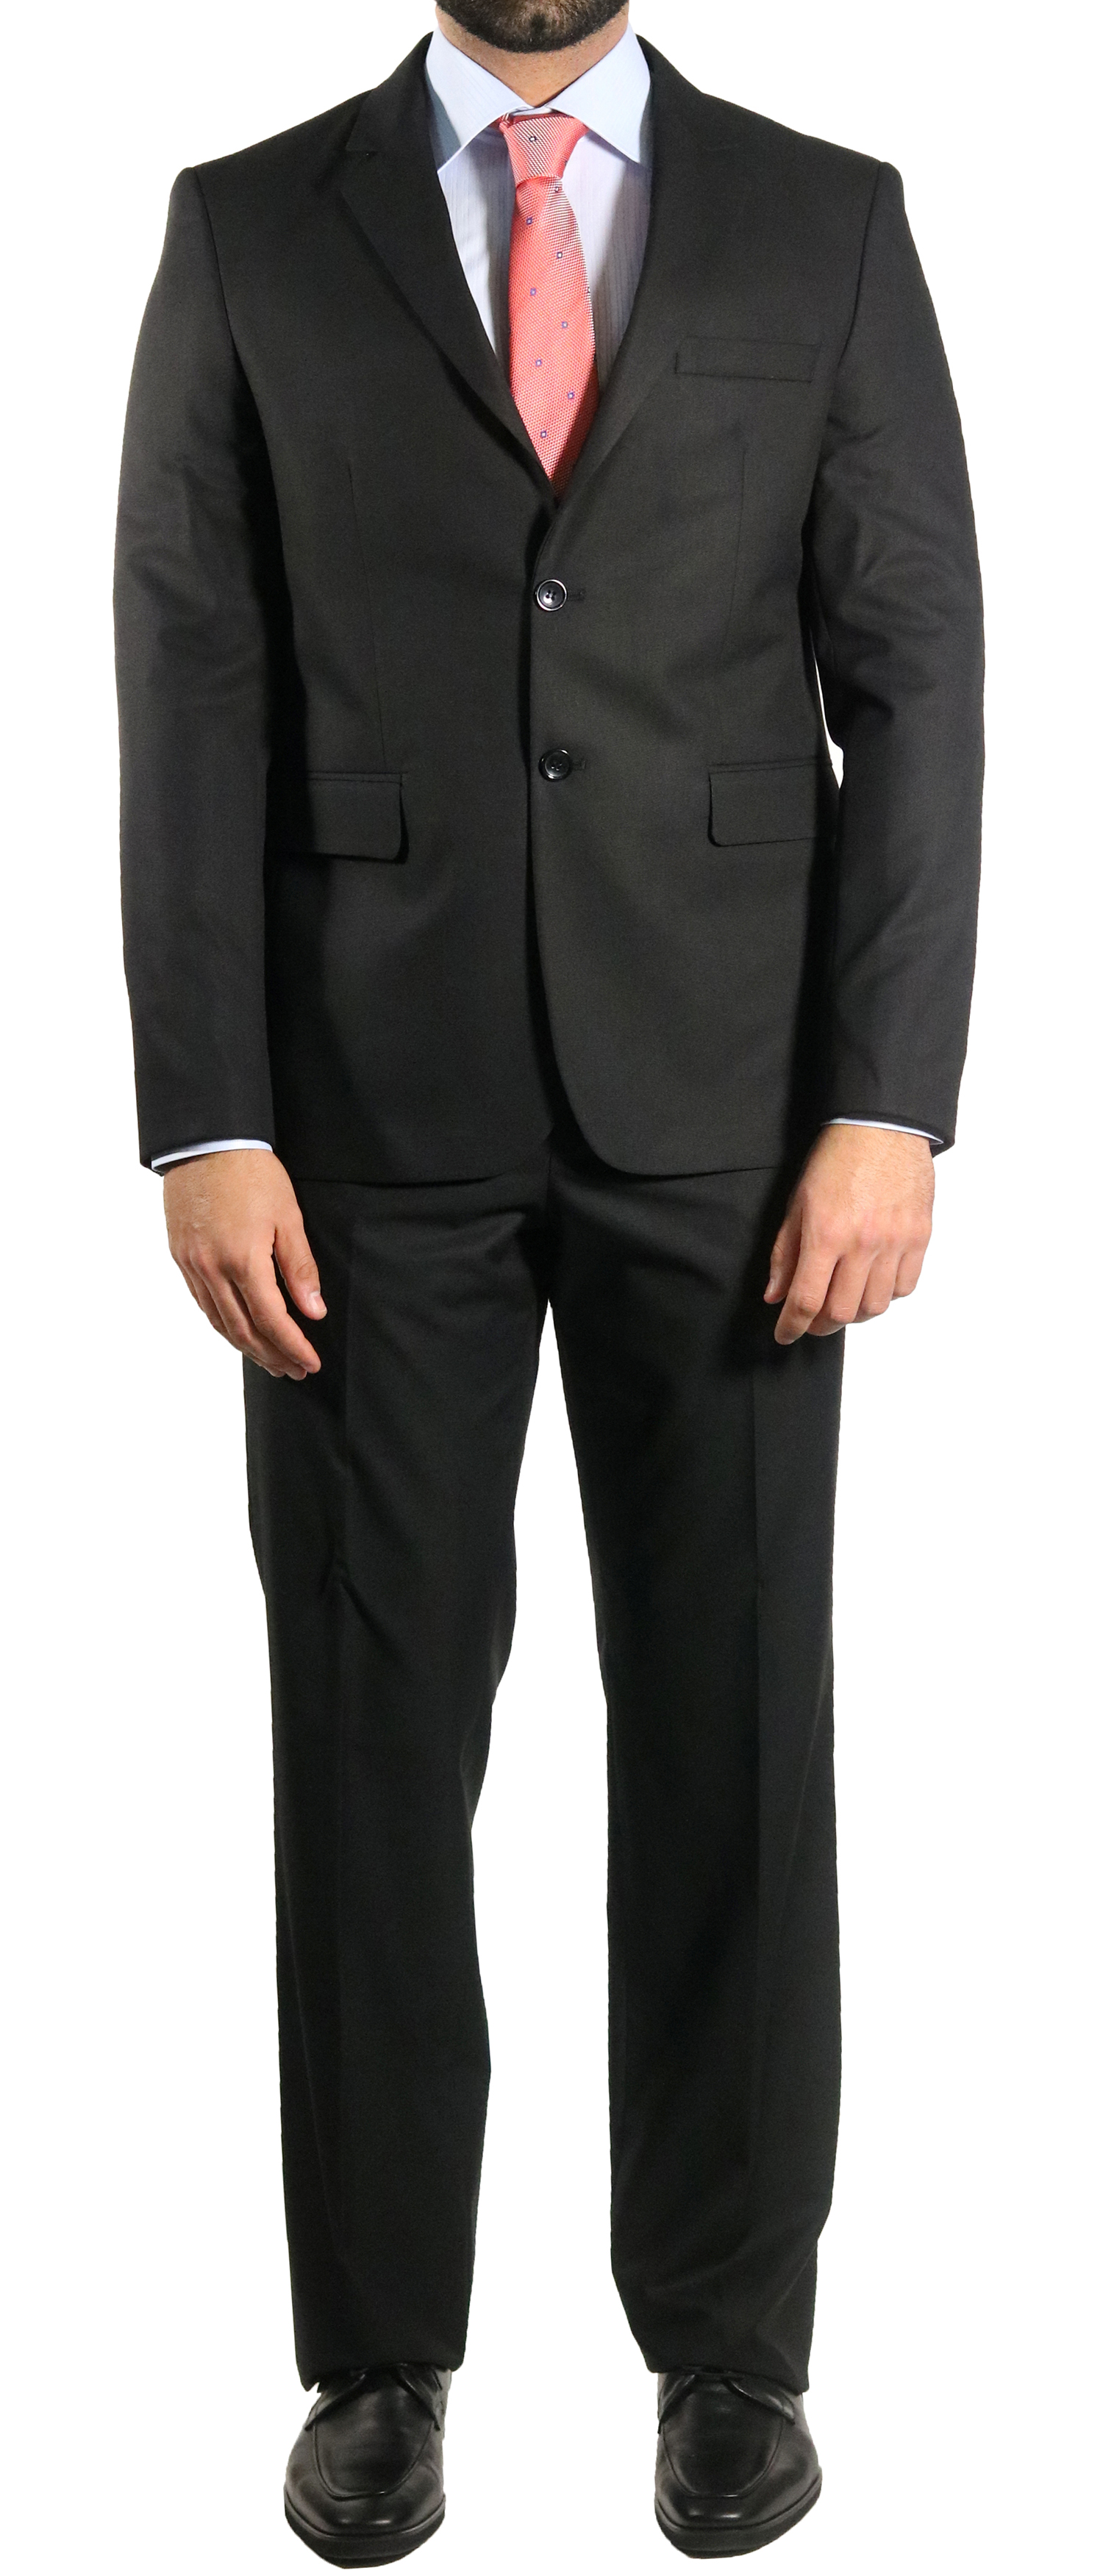 Buy low price, high quality anzug slim with worldwide shipping on universities2017.ml